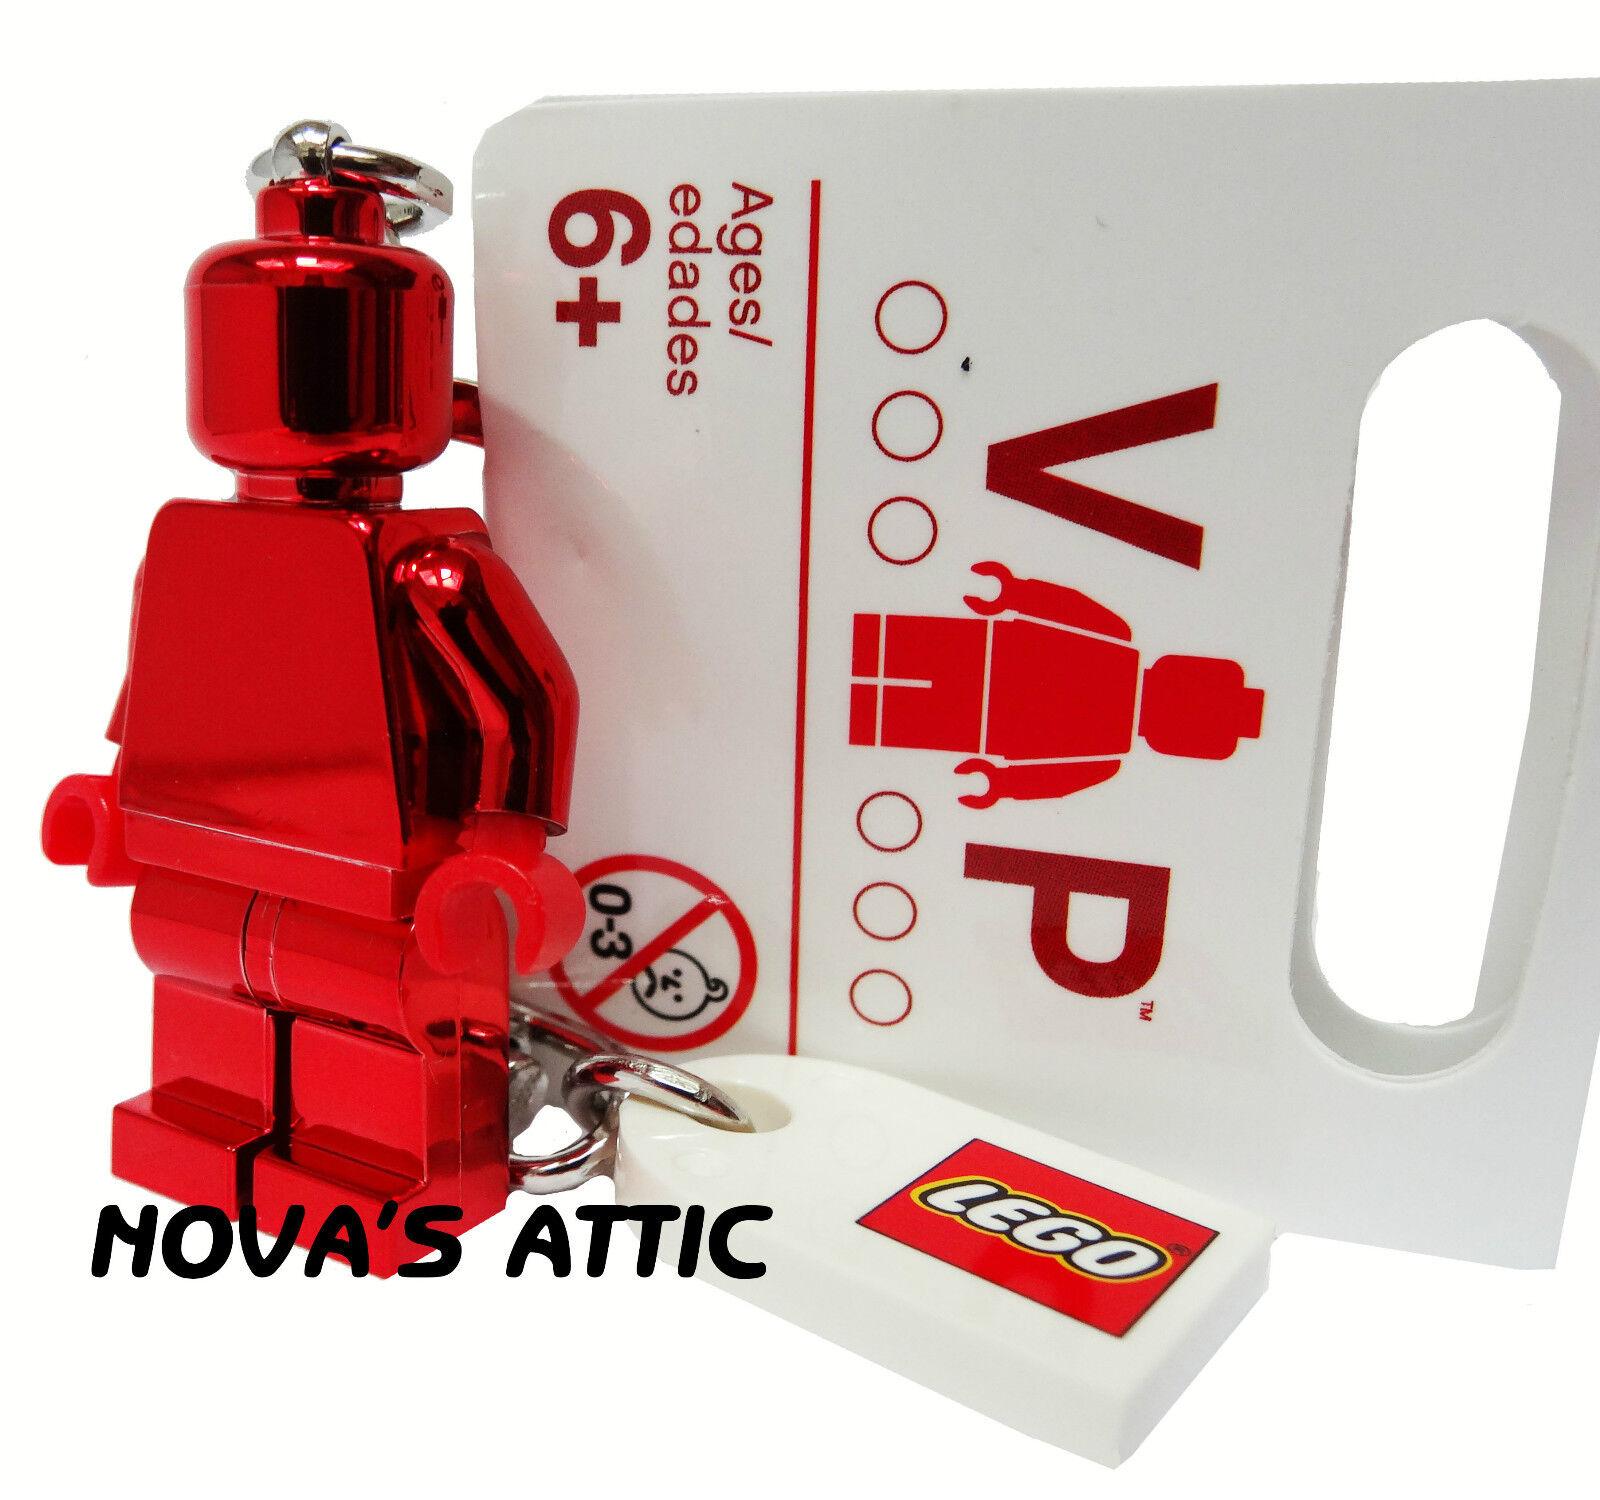 Noël coloré LEGO vip vip vip saint valentin 2013 rouge chrome porte-clés figurine neuf 3ec848